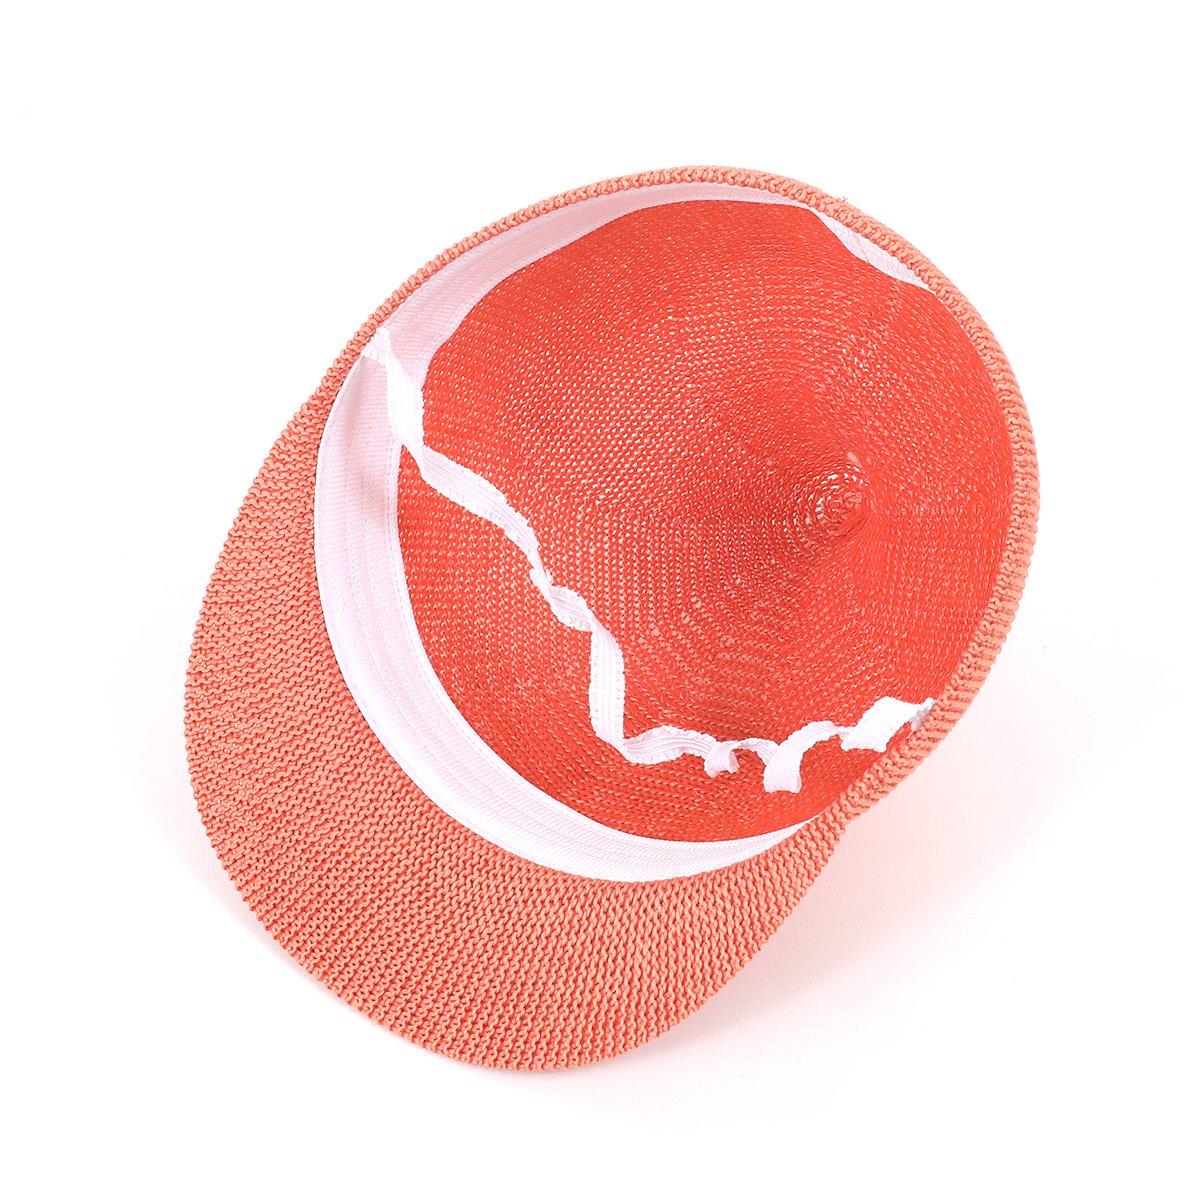 【BABY】Baby Tongari Thermo Cap 2 詳細画像5